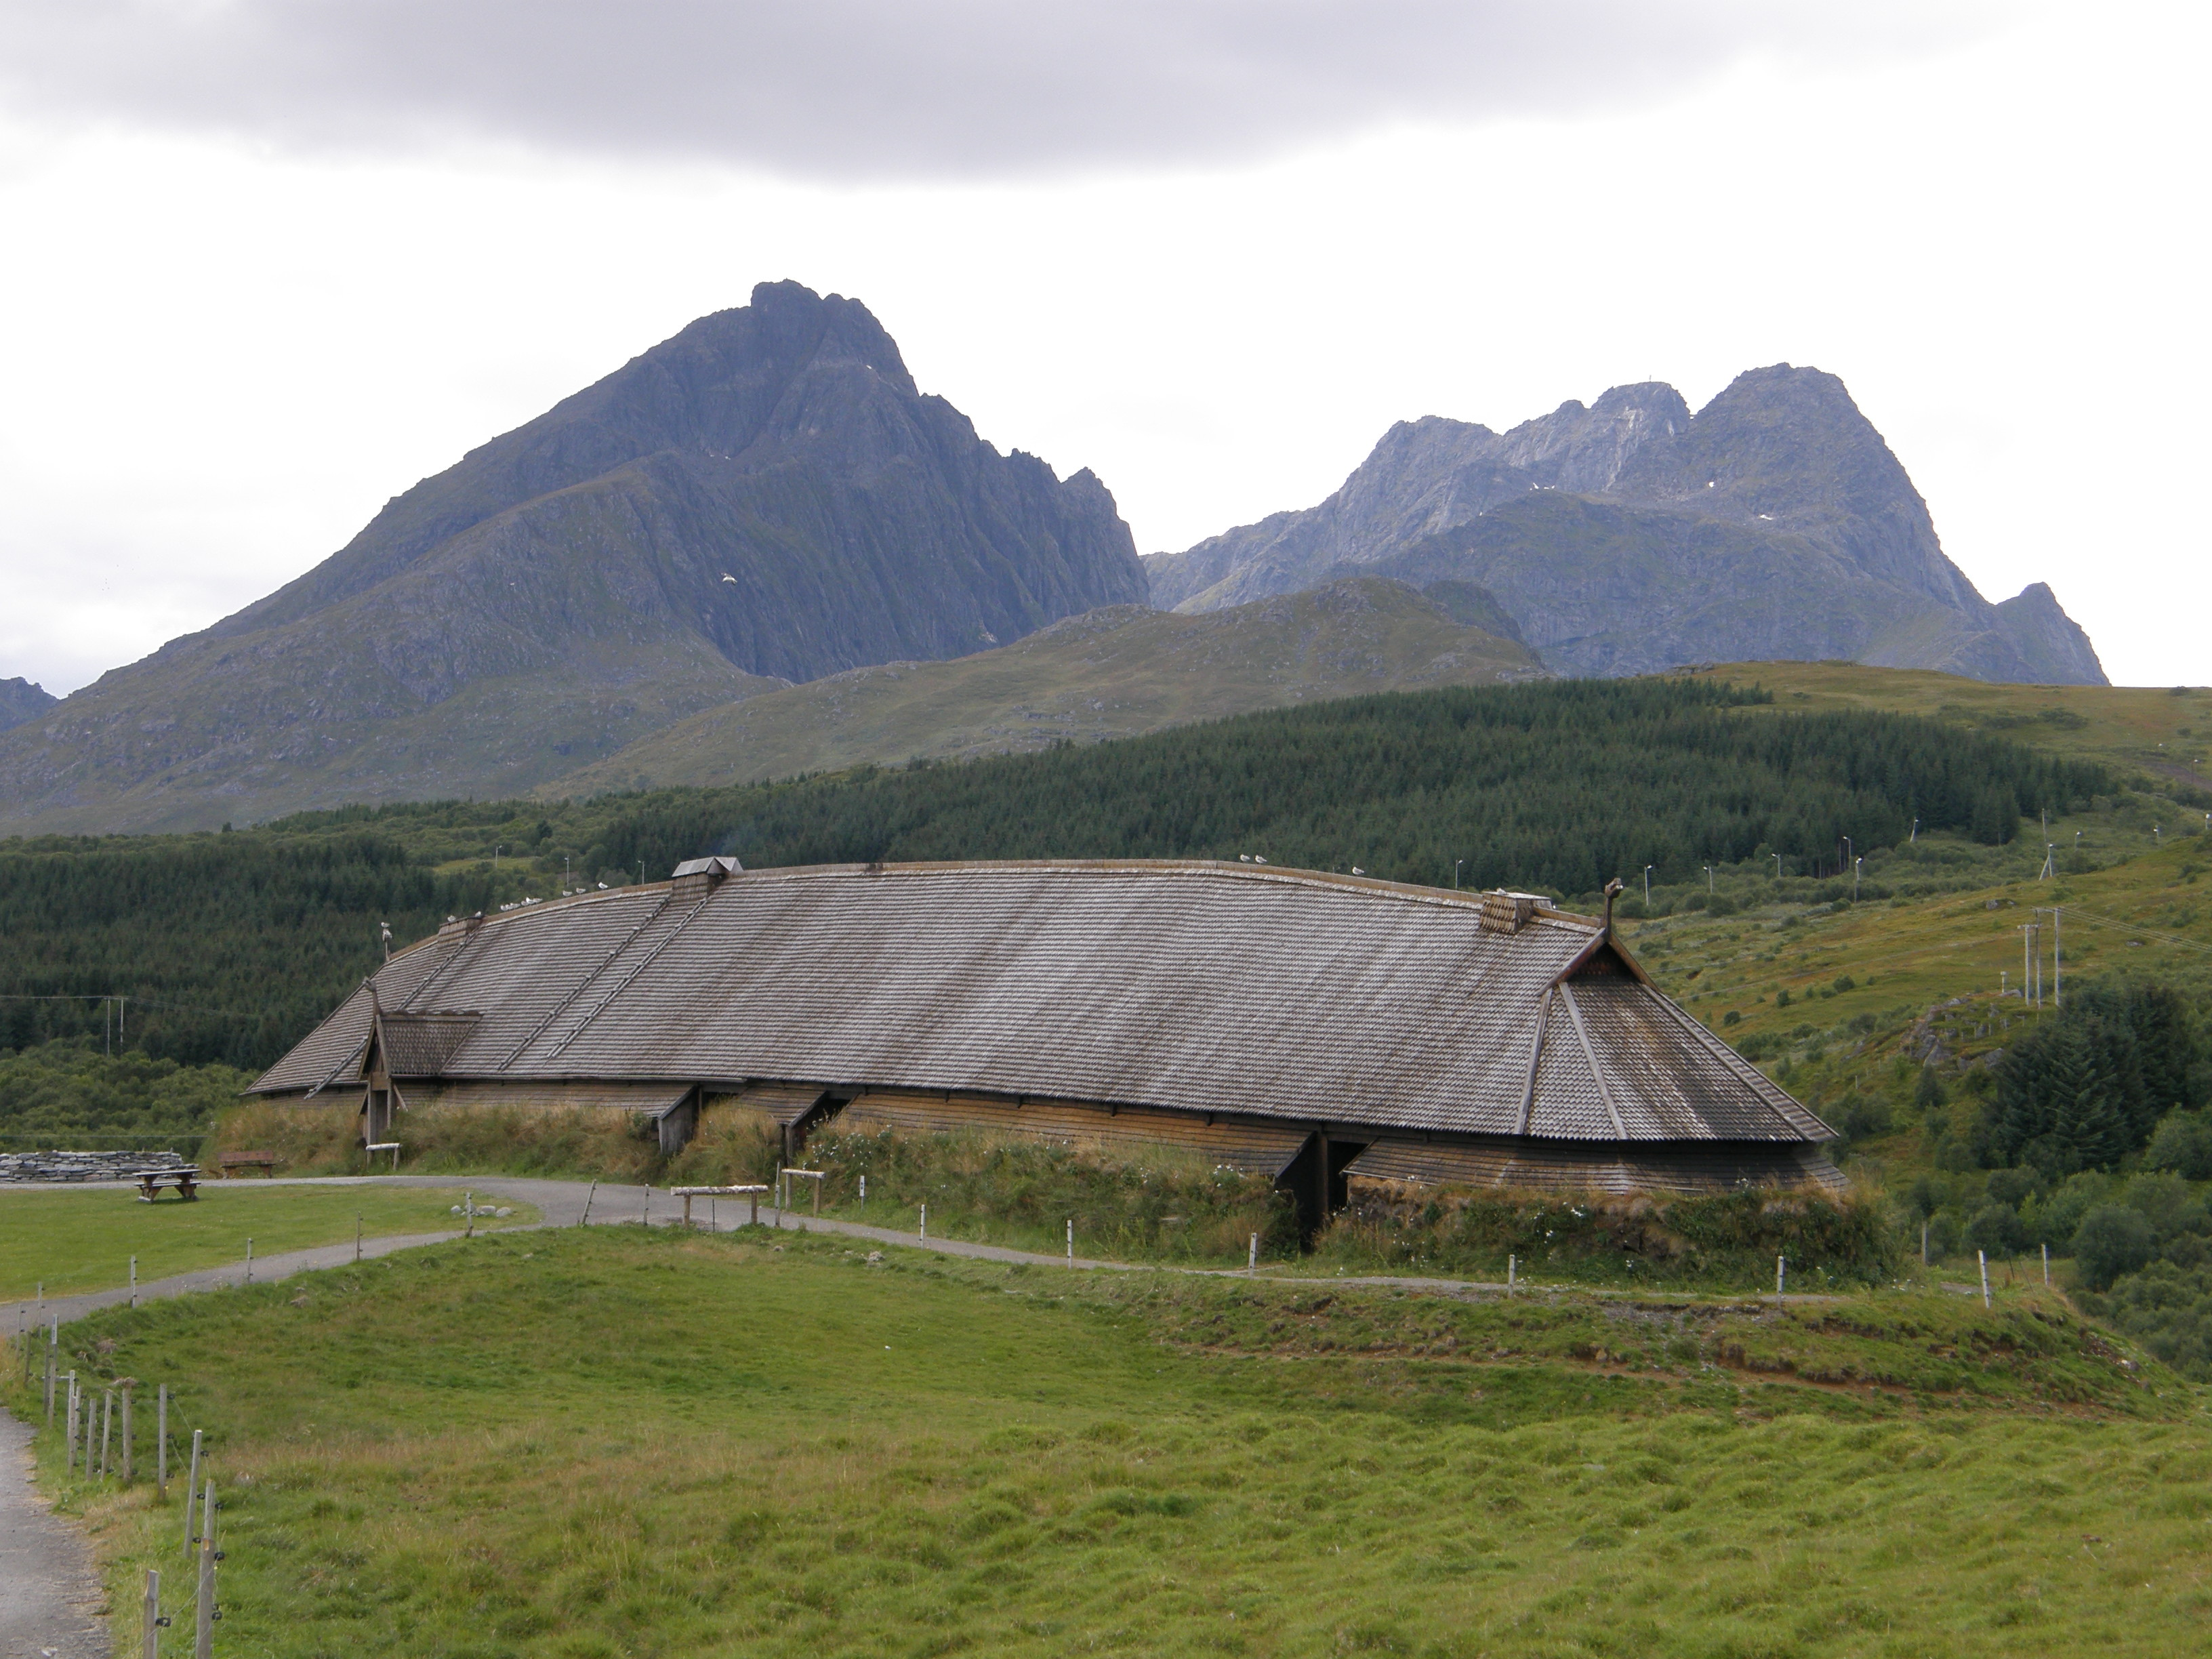 File:Viking longhouse - Borg 01.jpg - Wikimedia Commons